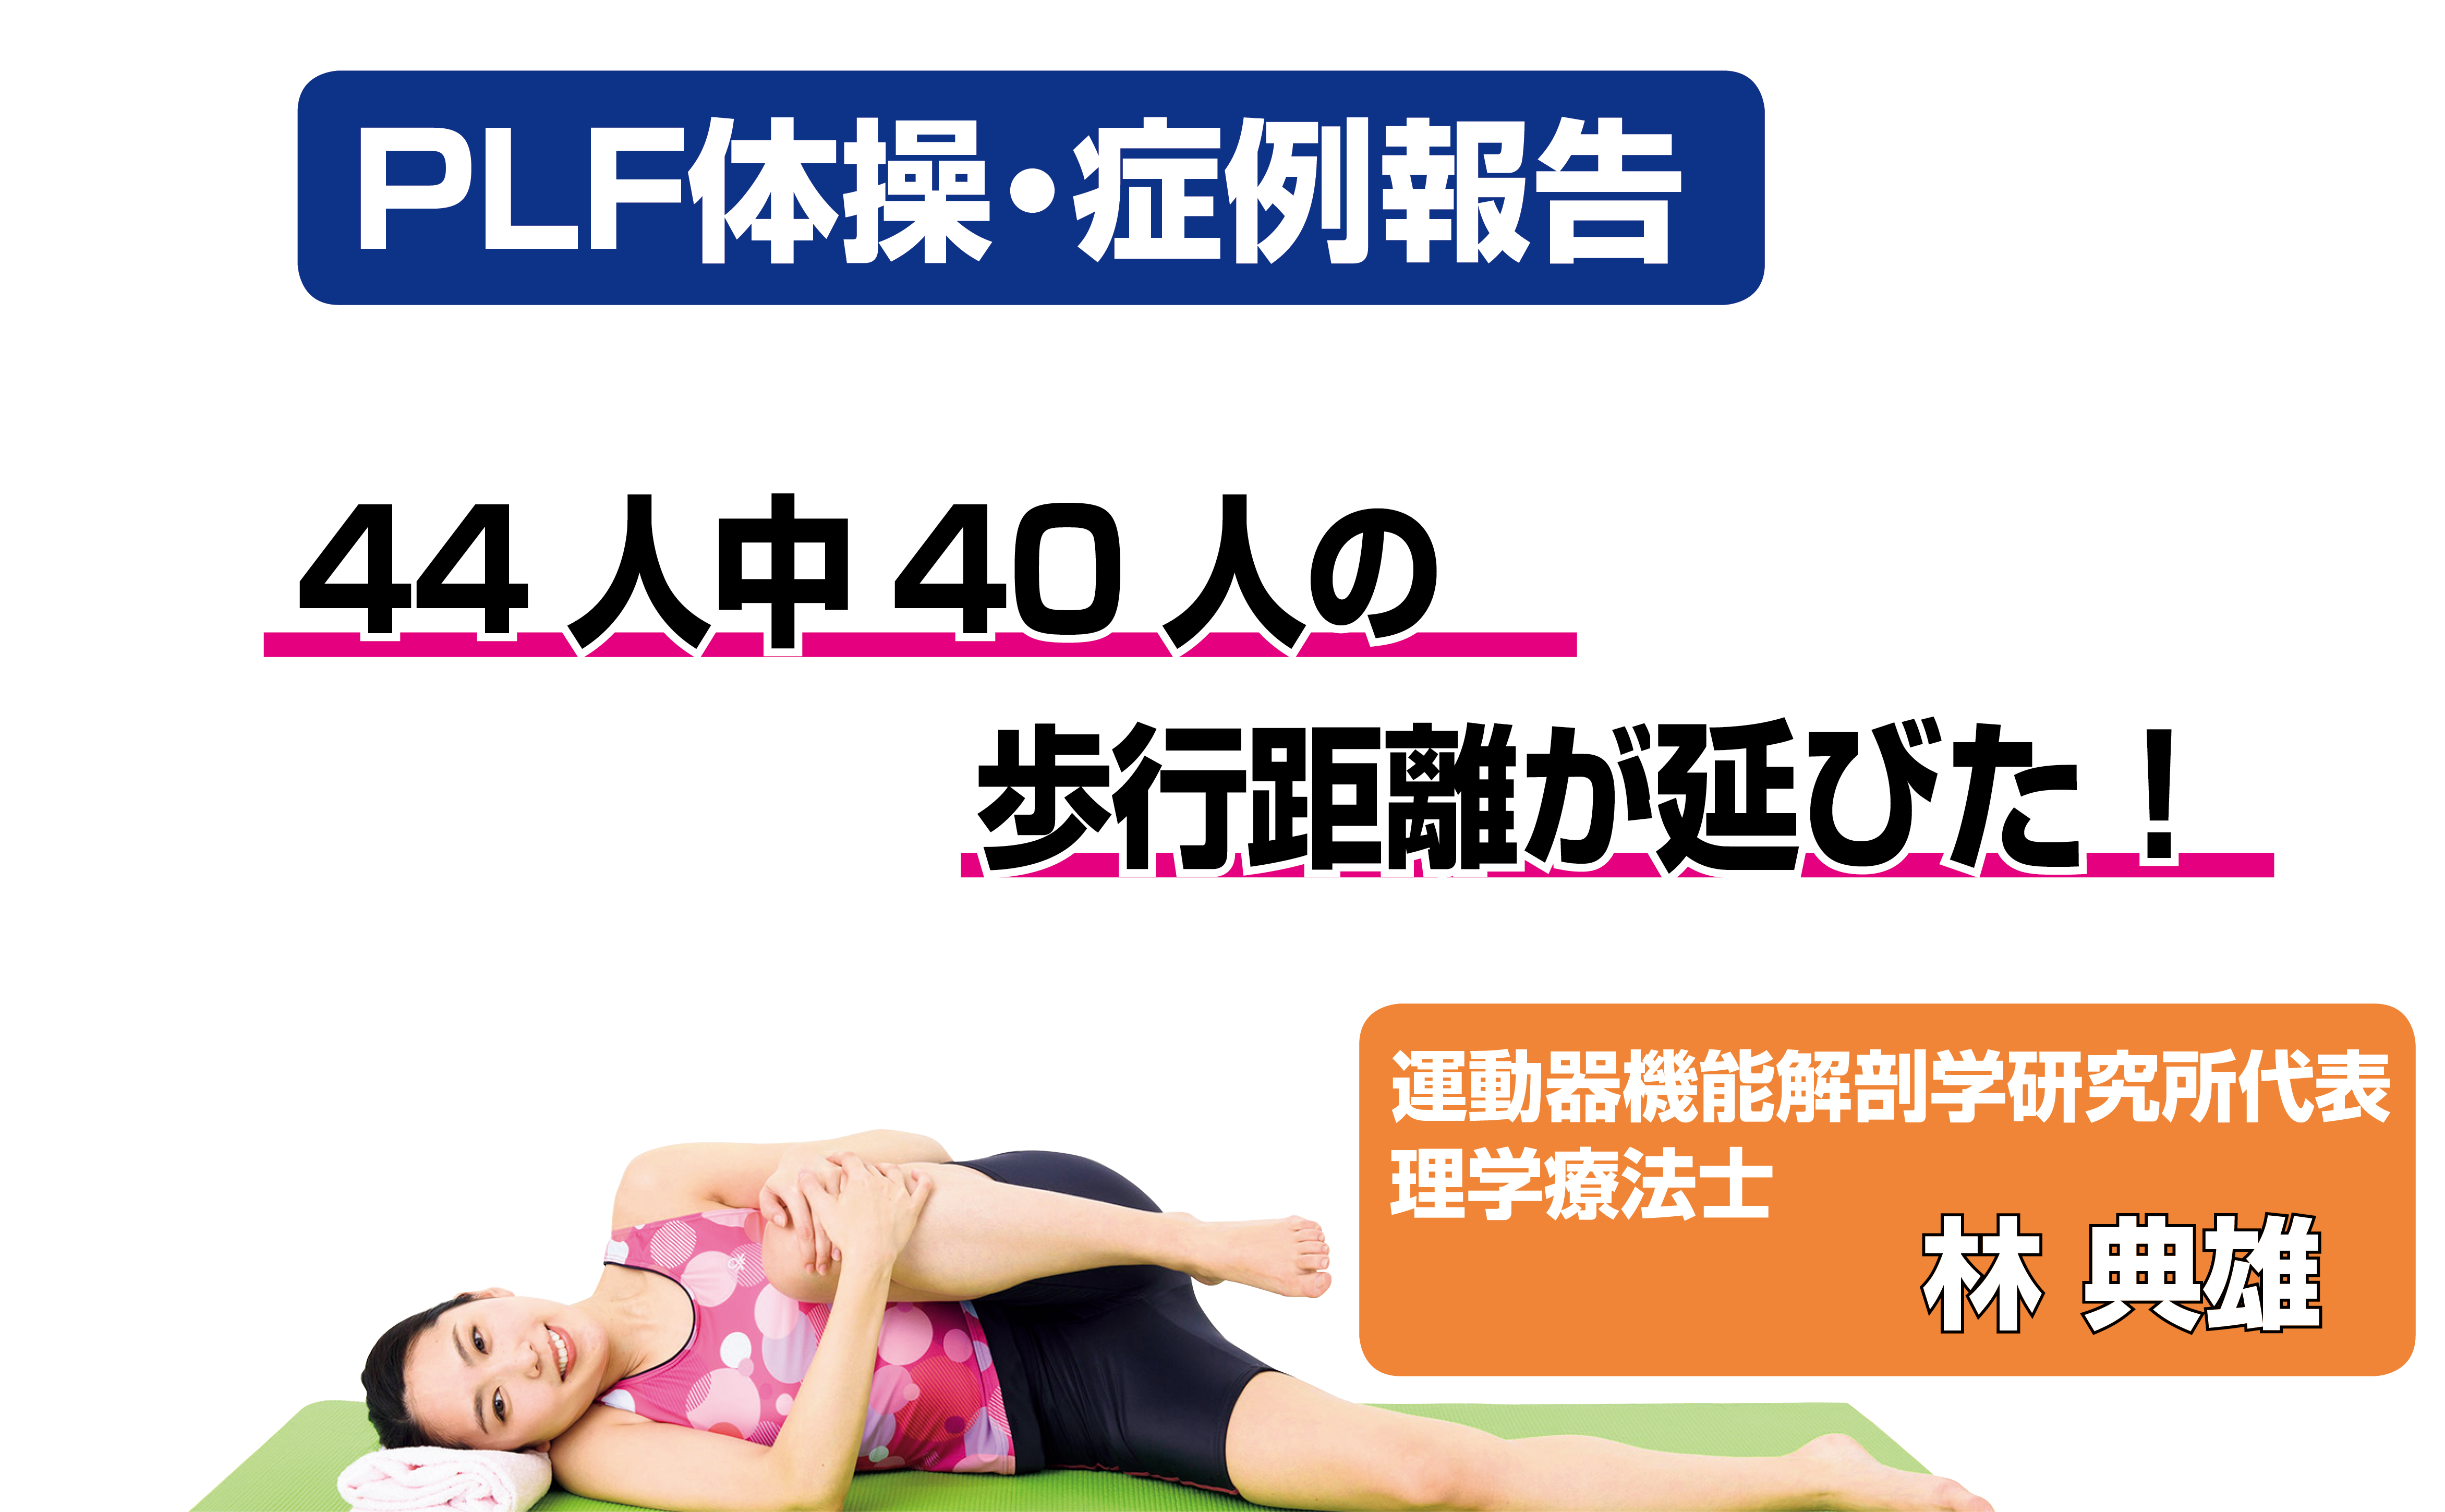 【PLF体操(8/9)症例報告】44人中40人の歩行距離が延びた!